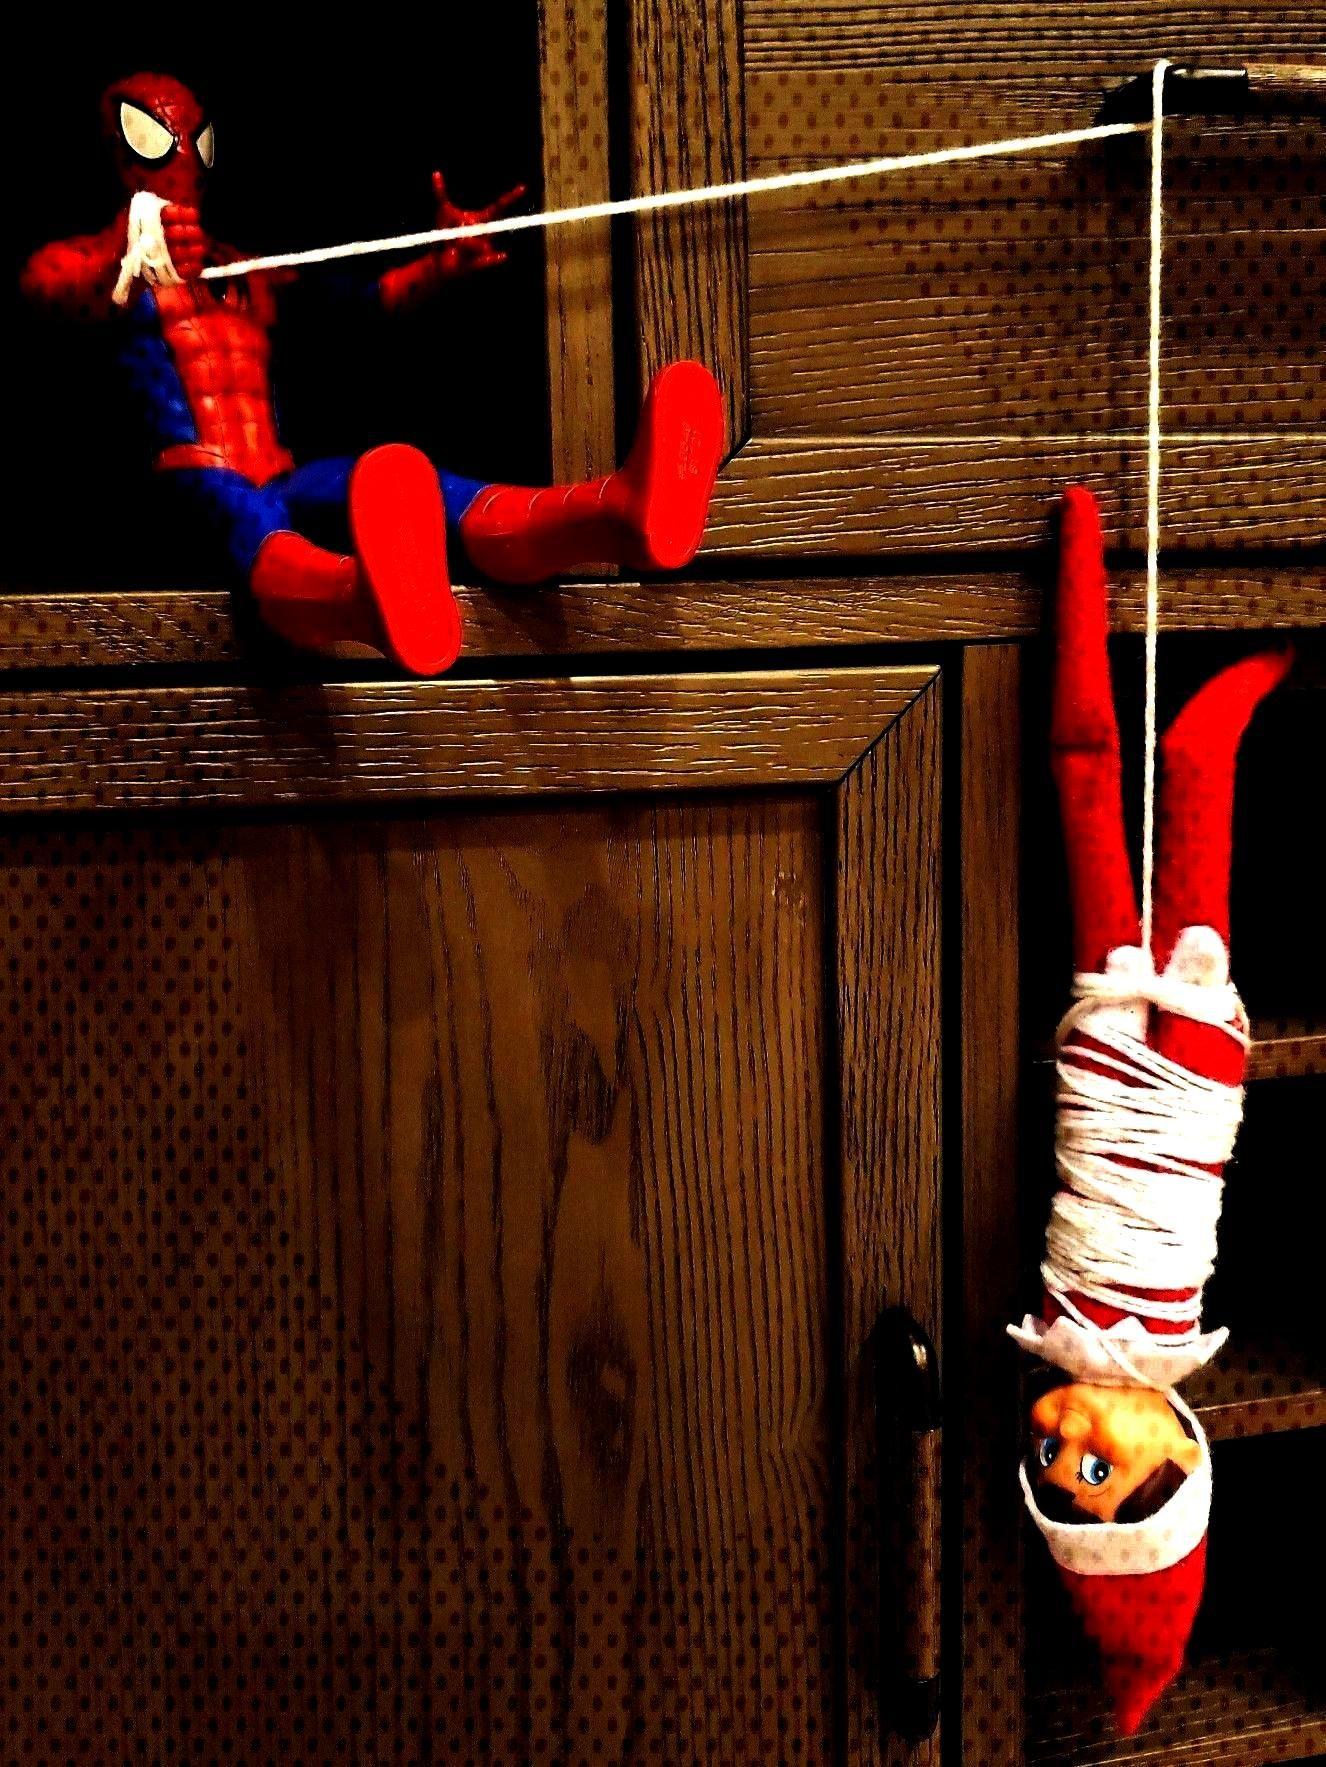 Eddie the elf on the shelf idea with Spiderman, super hero  Thoughts   Eddie the elf on the shelf i